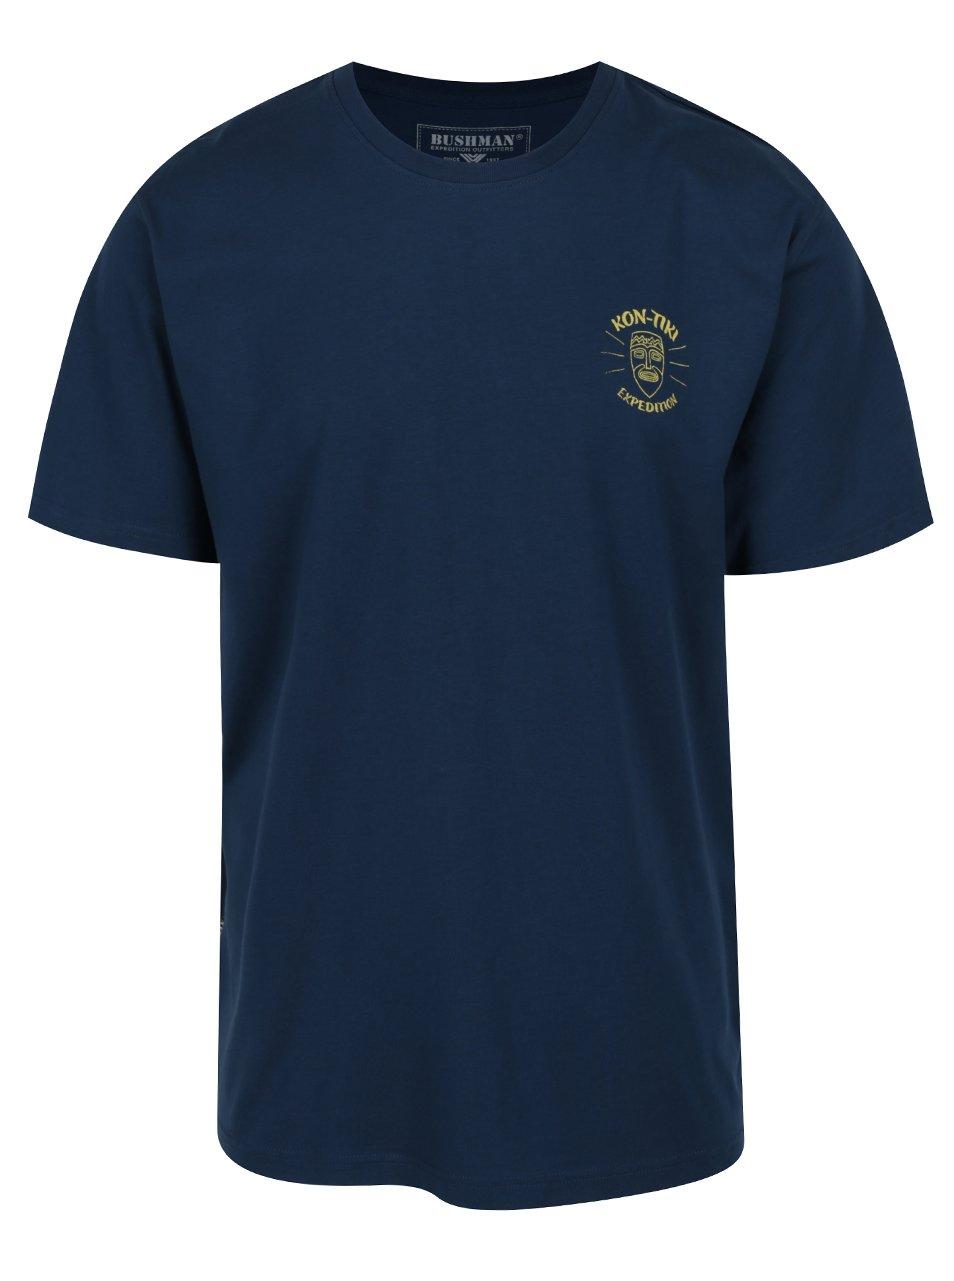 Tmavě modré pánské triko s potiskem BUSHMAN Axis